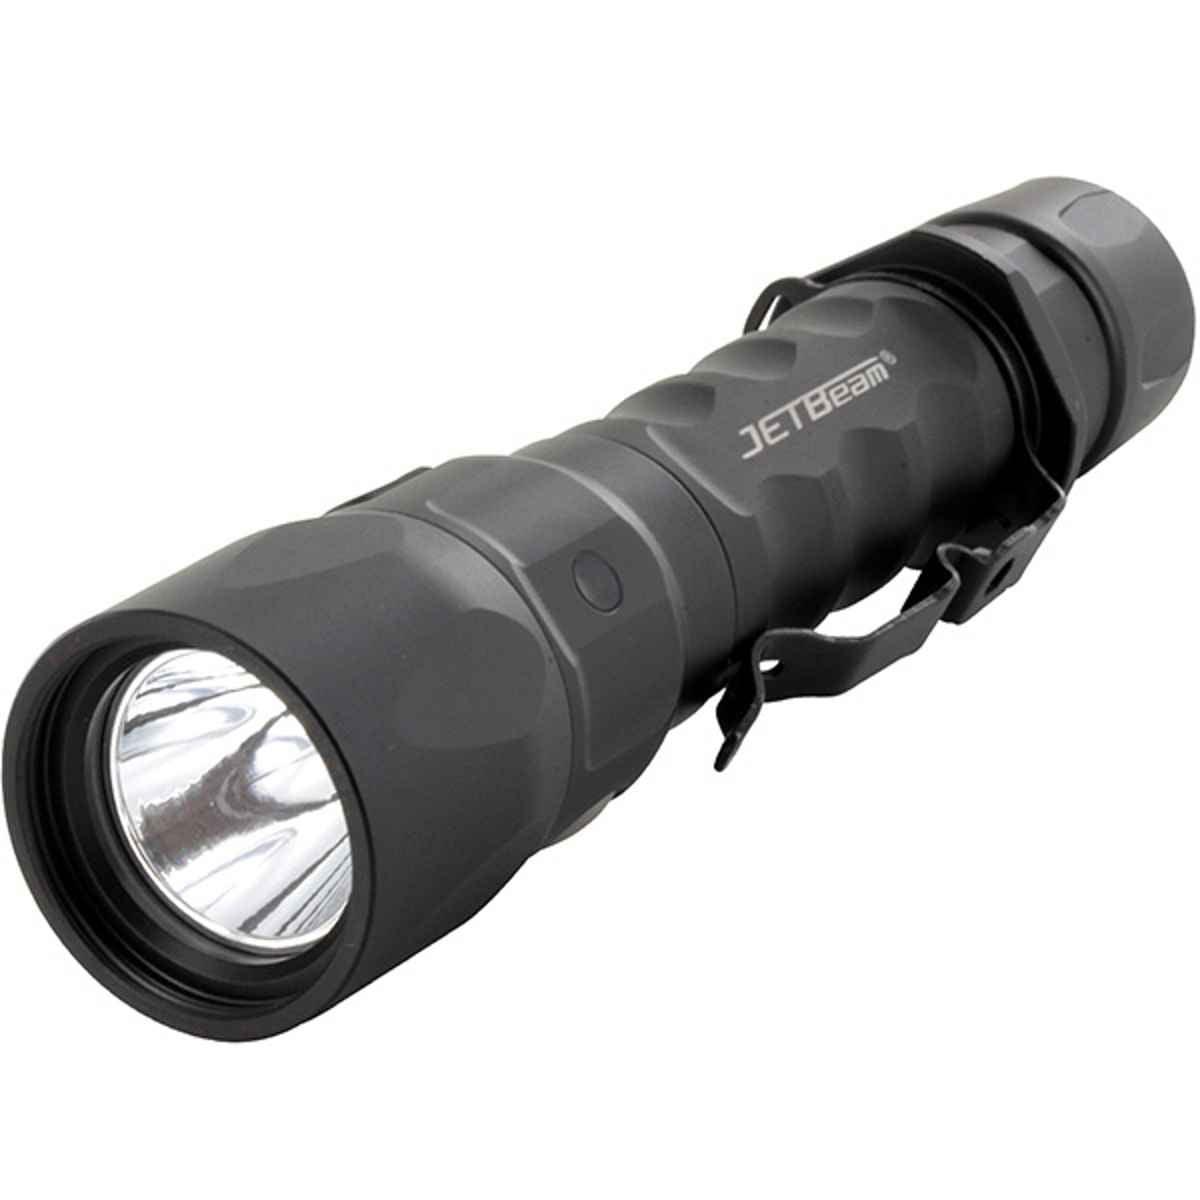 Jetbeam Jet-IM Rechargeable Flashlight Black - JBJET-IM